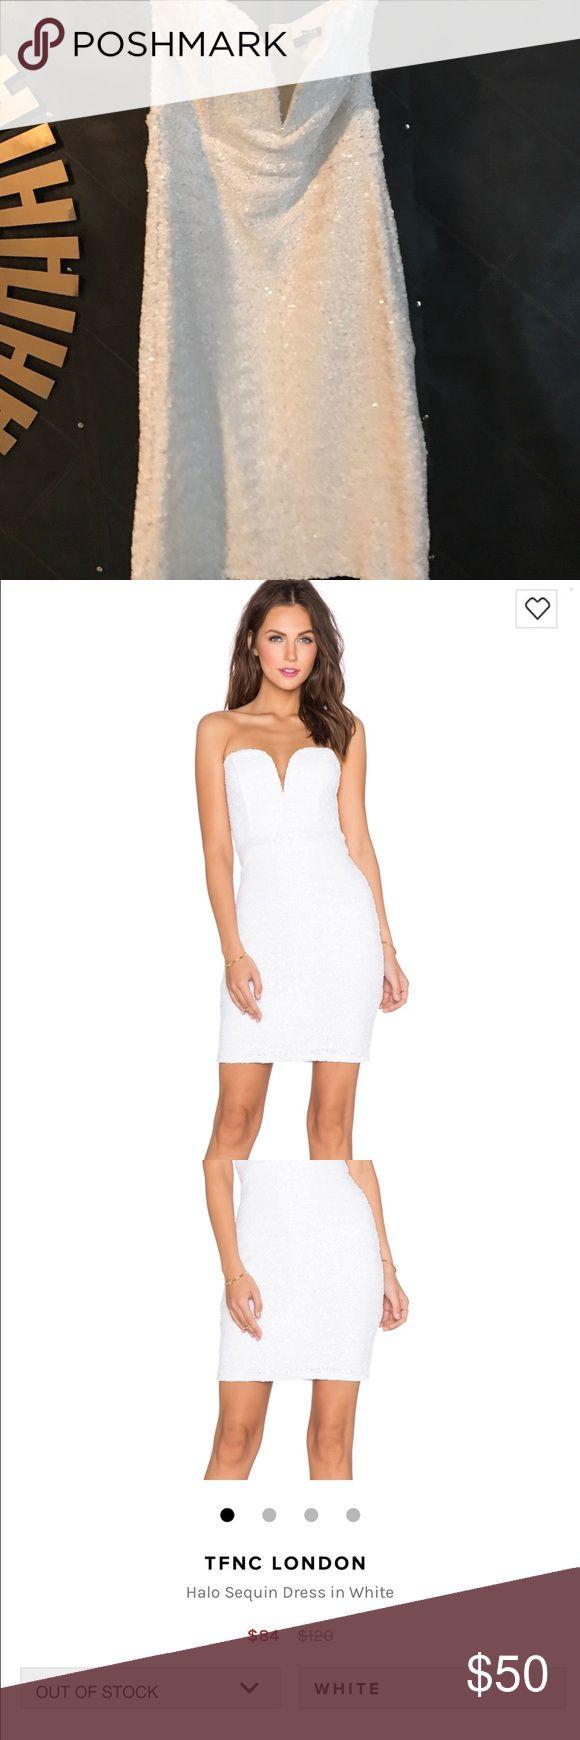 TFNC London white sequin dress from revolve! Only worn once great dress! TFNC London  Dresses Mini